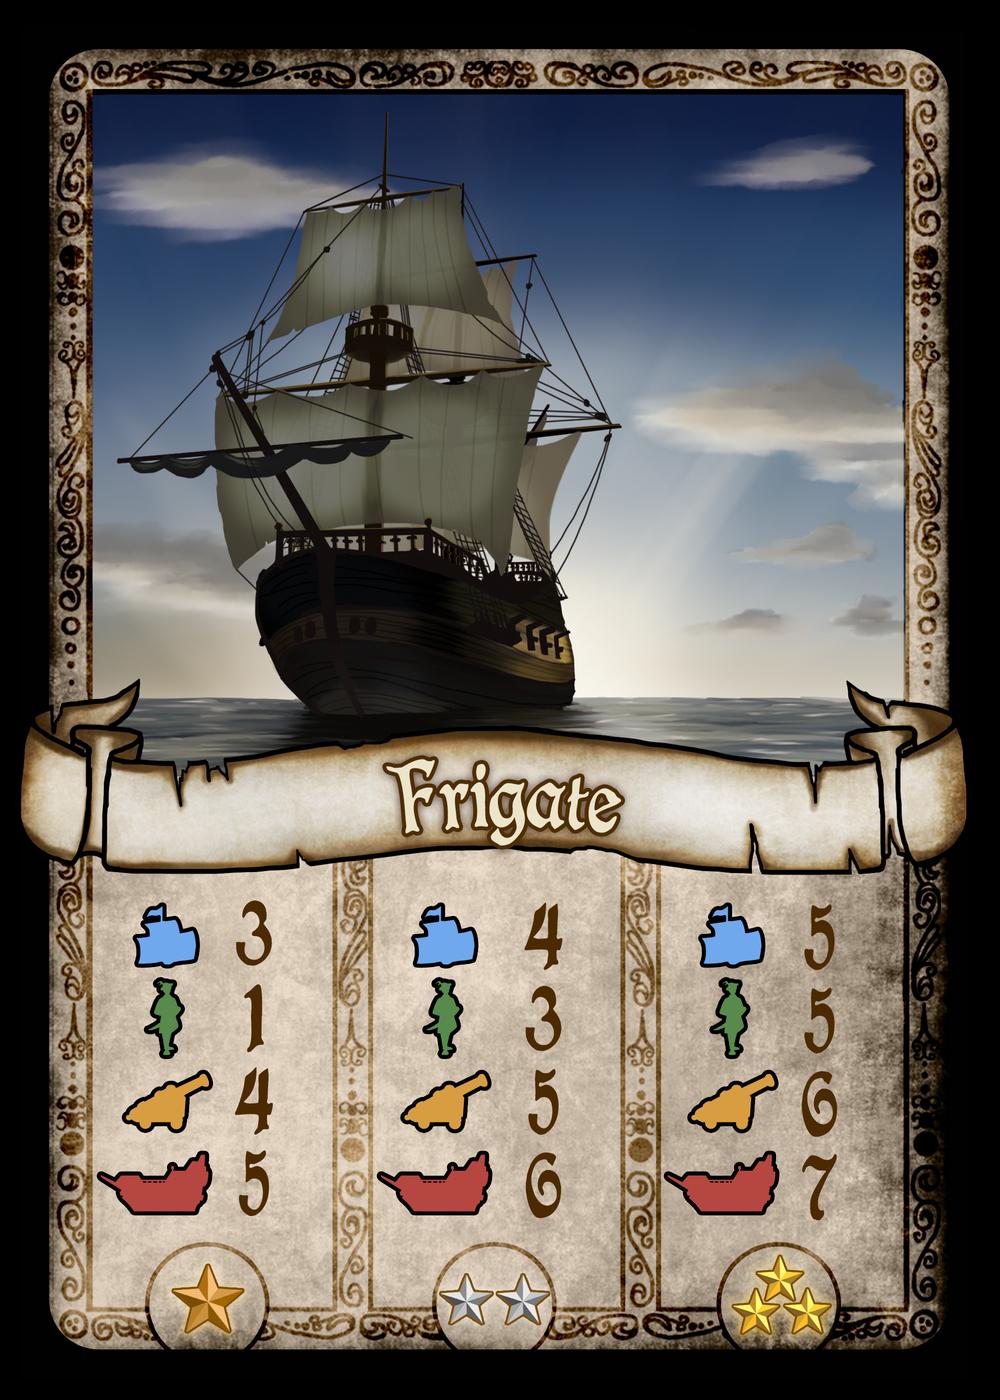 frigate.jpg